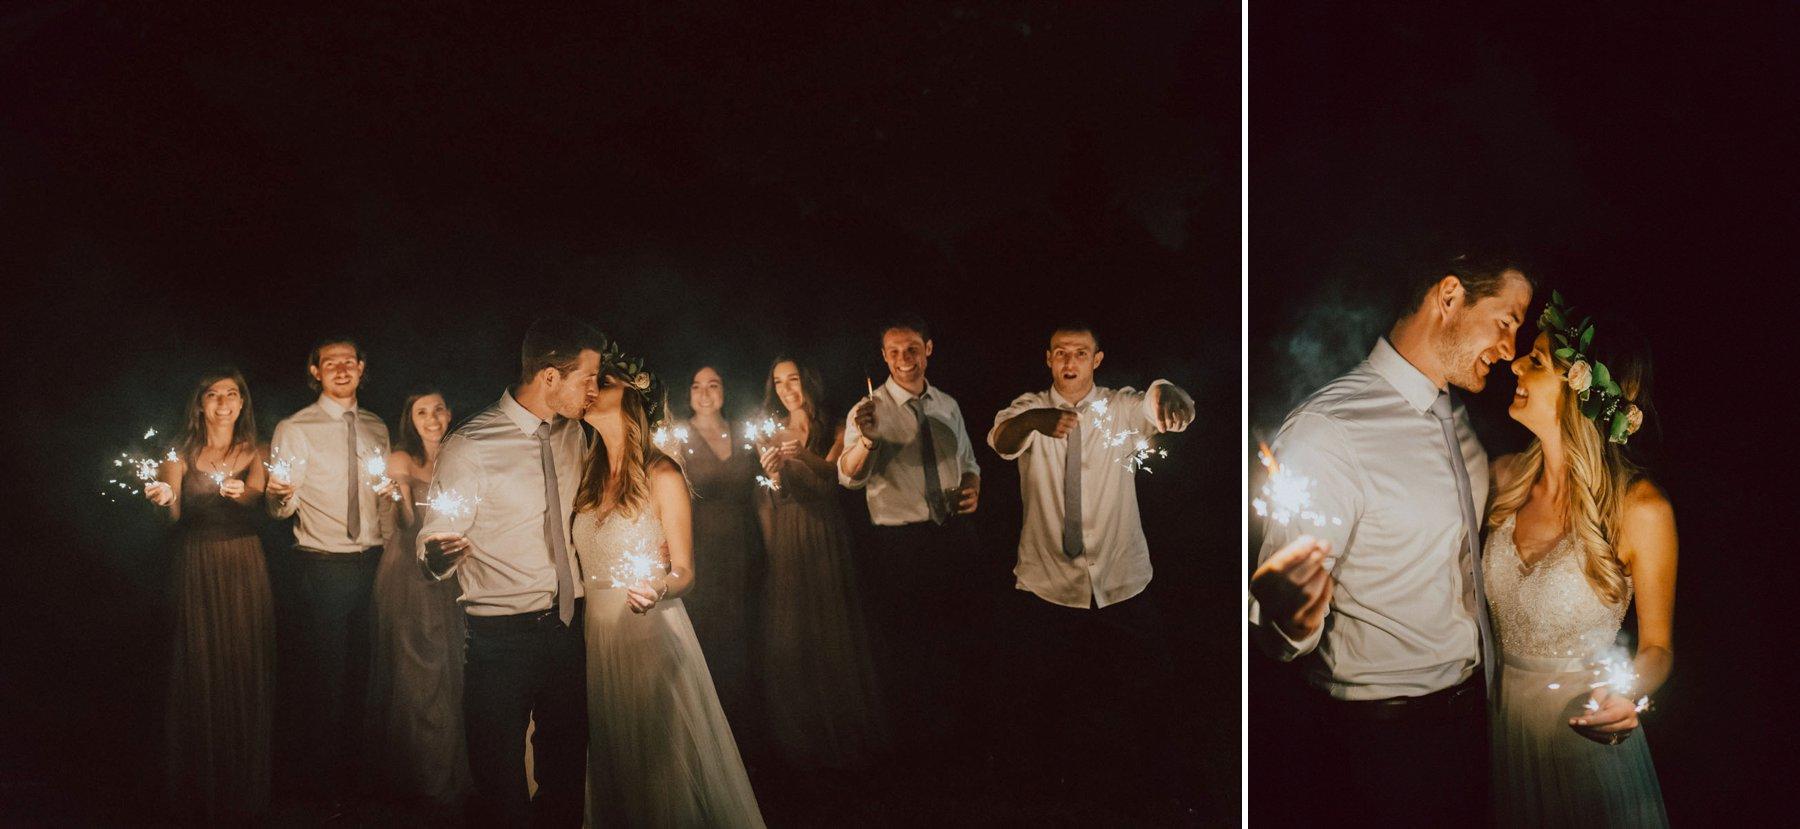 Knowlton-mansion-wedding-148.jpg